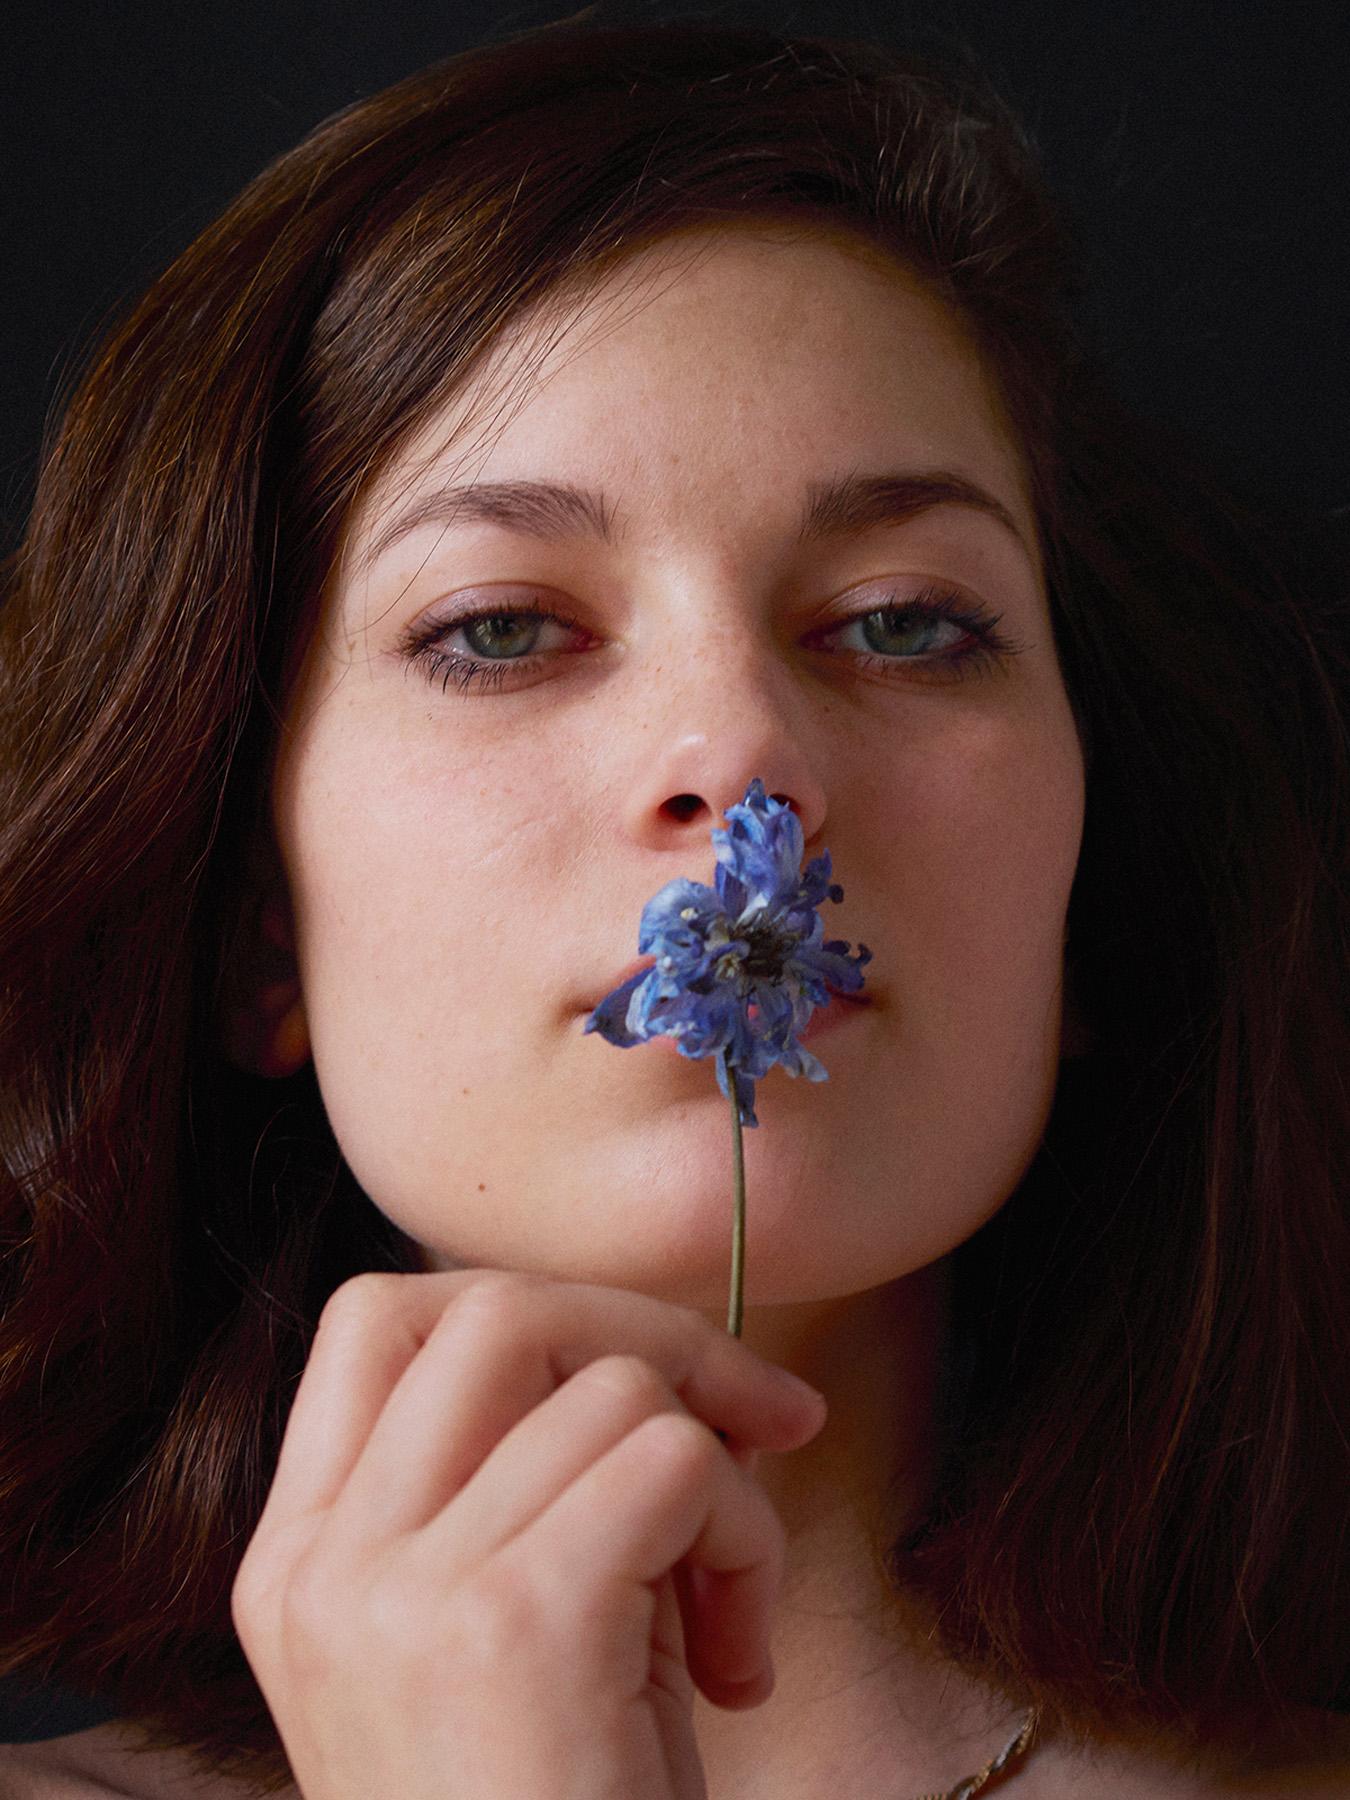 028-icon-artist-management-Kristin-Vicari-Girls and Flowers-28.jpg